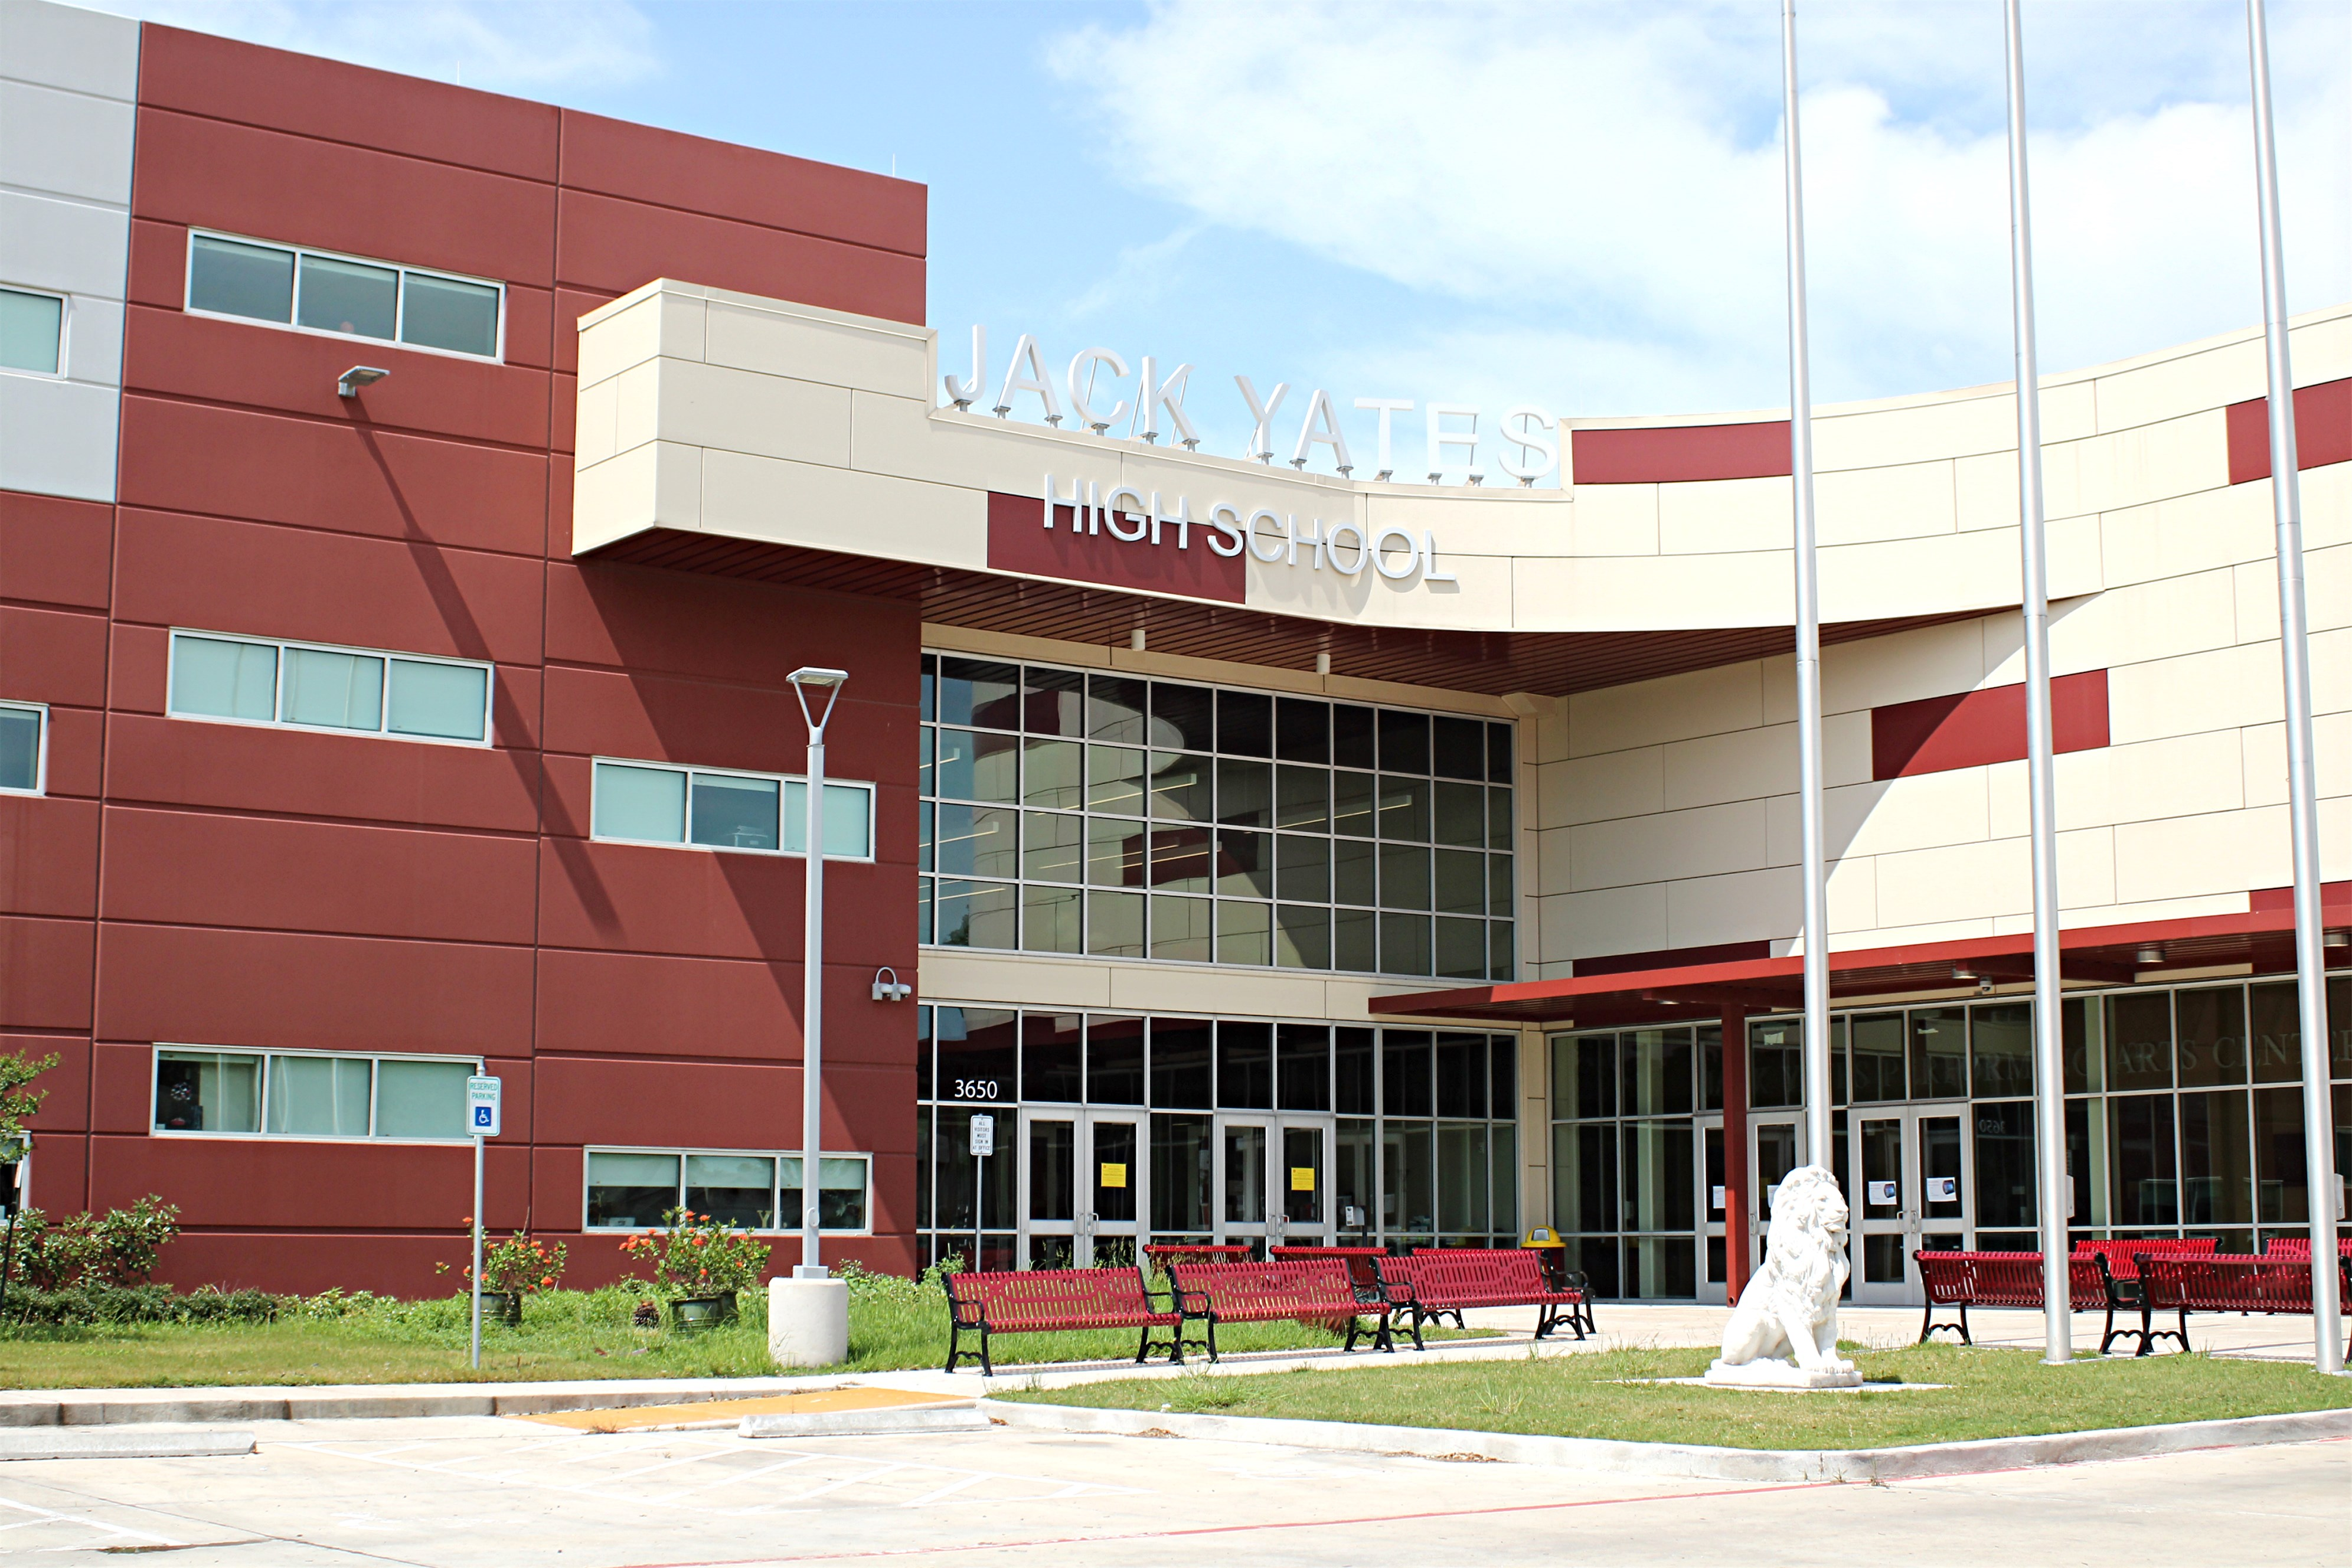 Yates High School Wikipedia